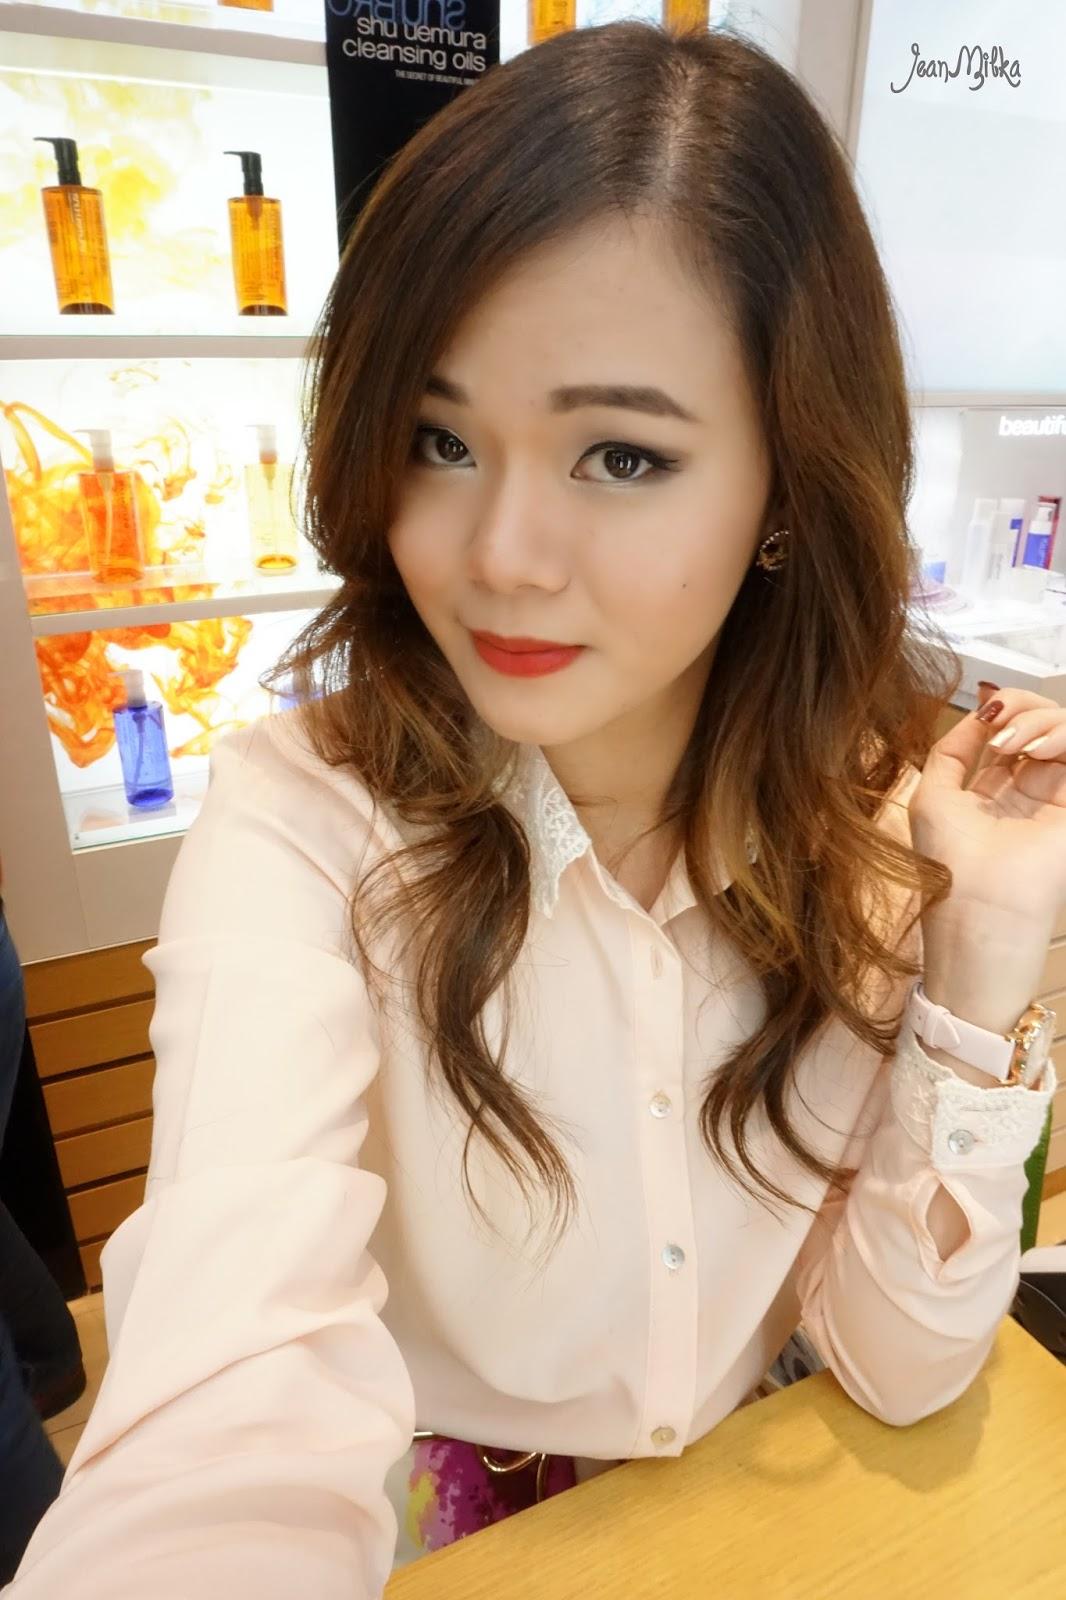 motd, jean milka, shu uemura, tint in gelato, red lipstick, red, lip, makeup, blogger, glam, glamorous